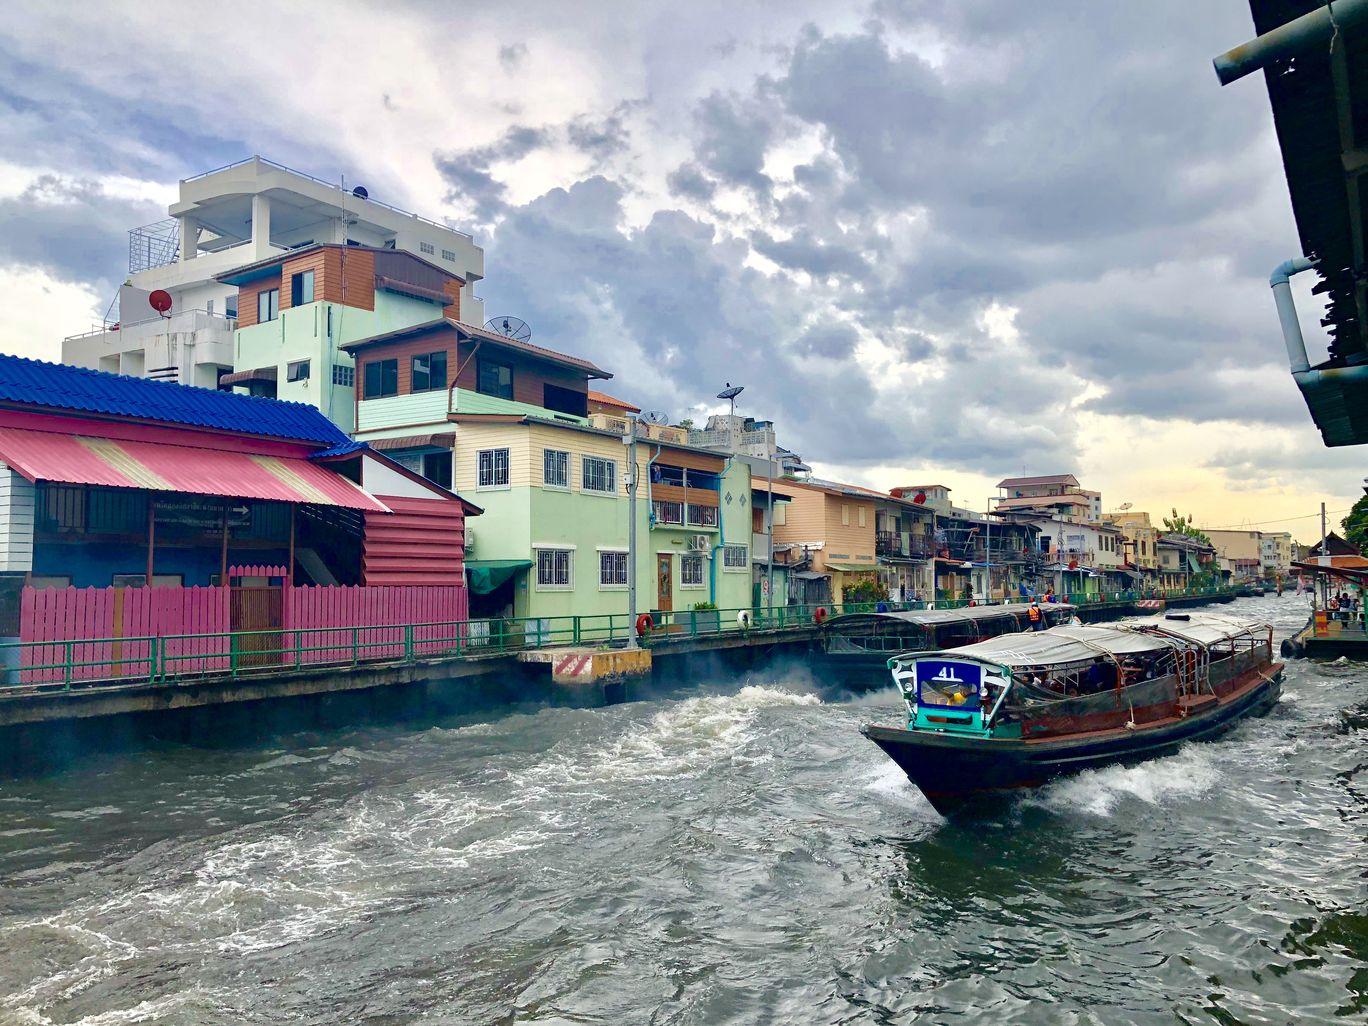 Photo of Bangkok By Deepak bhatia